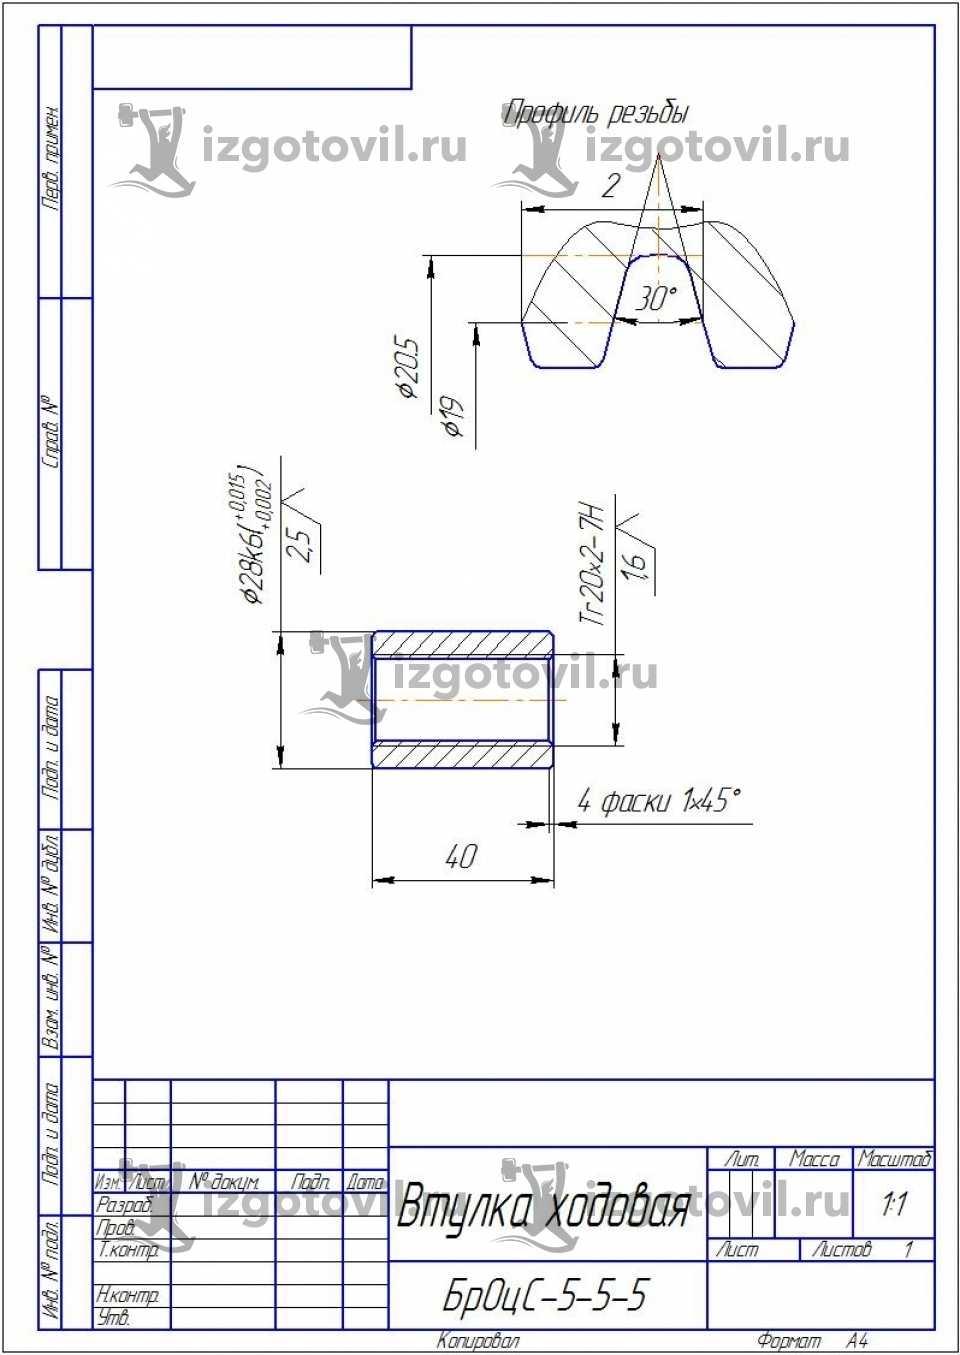 Токарно-фрезерная обработка - изготовление оправки